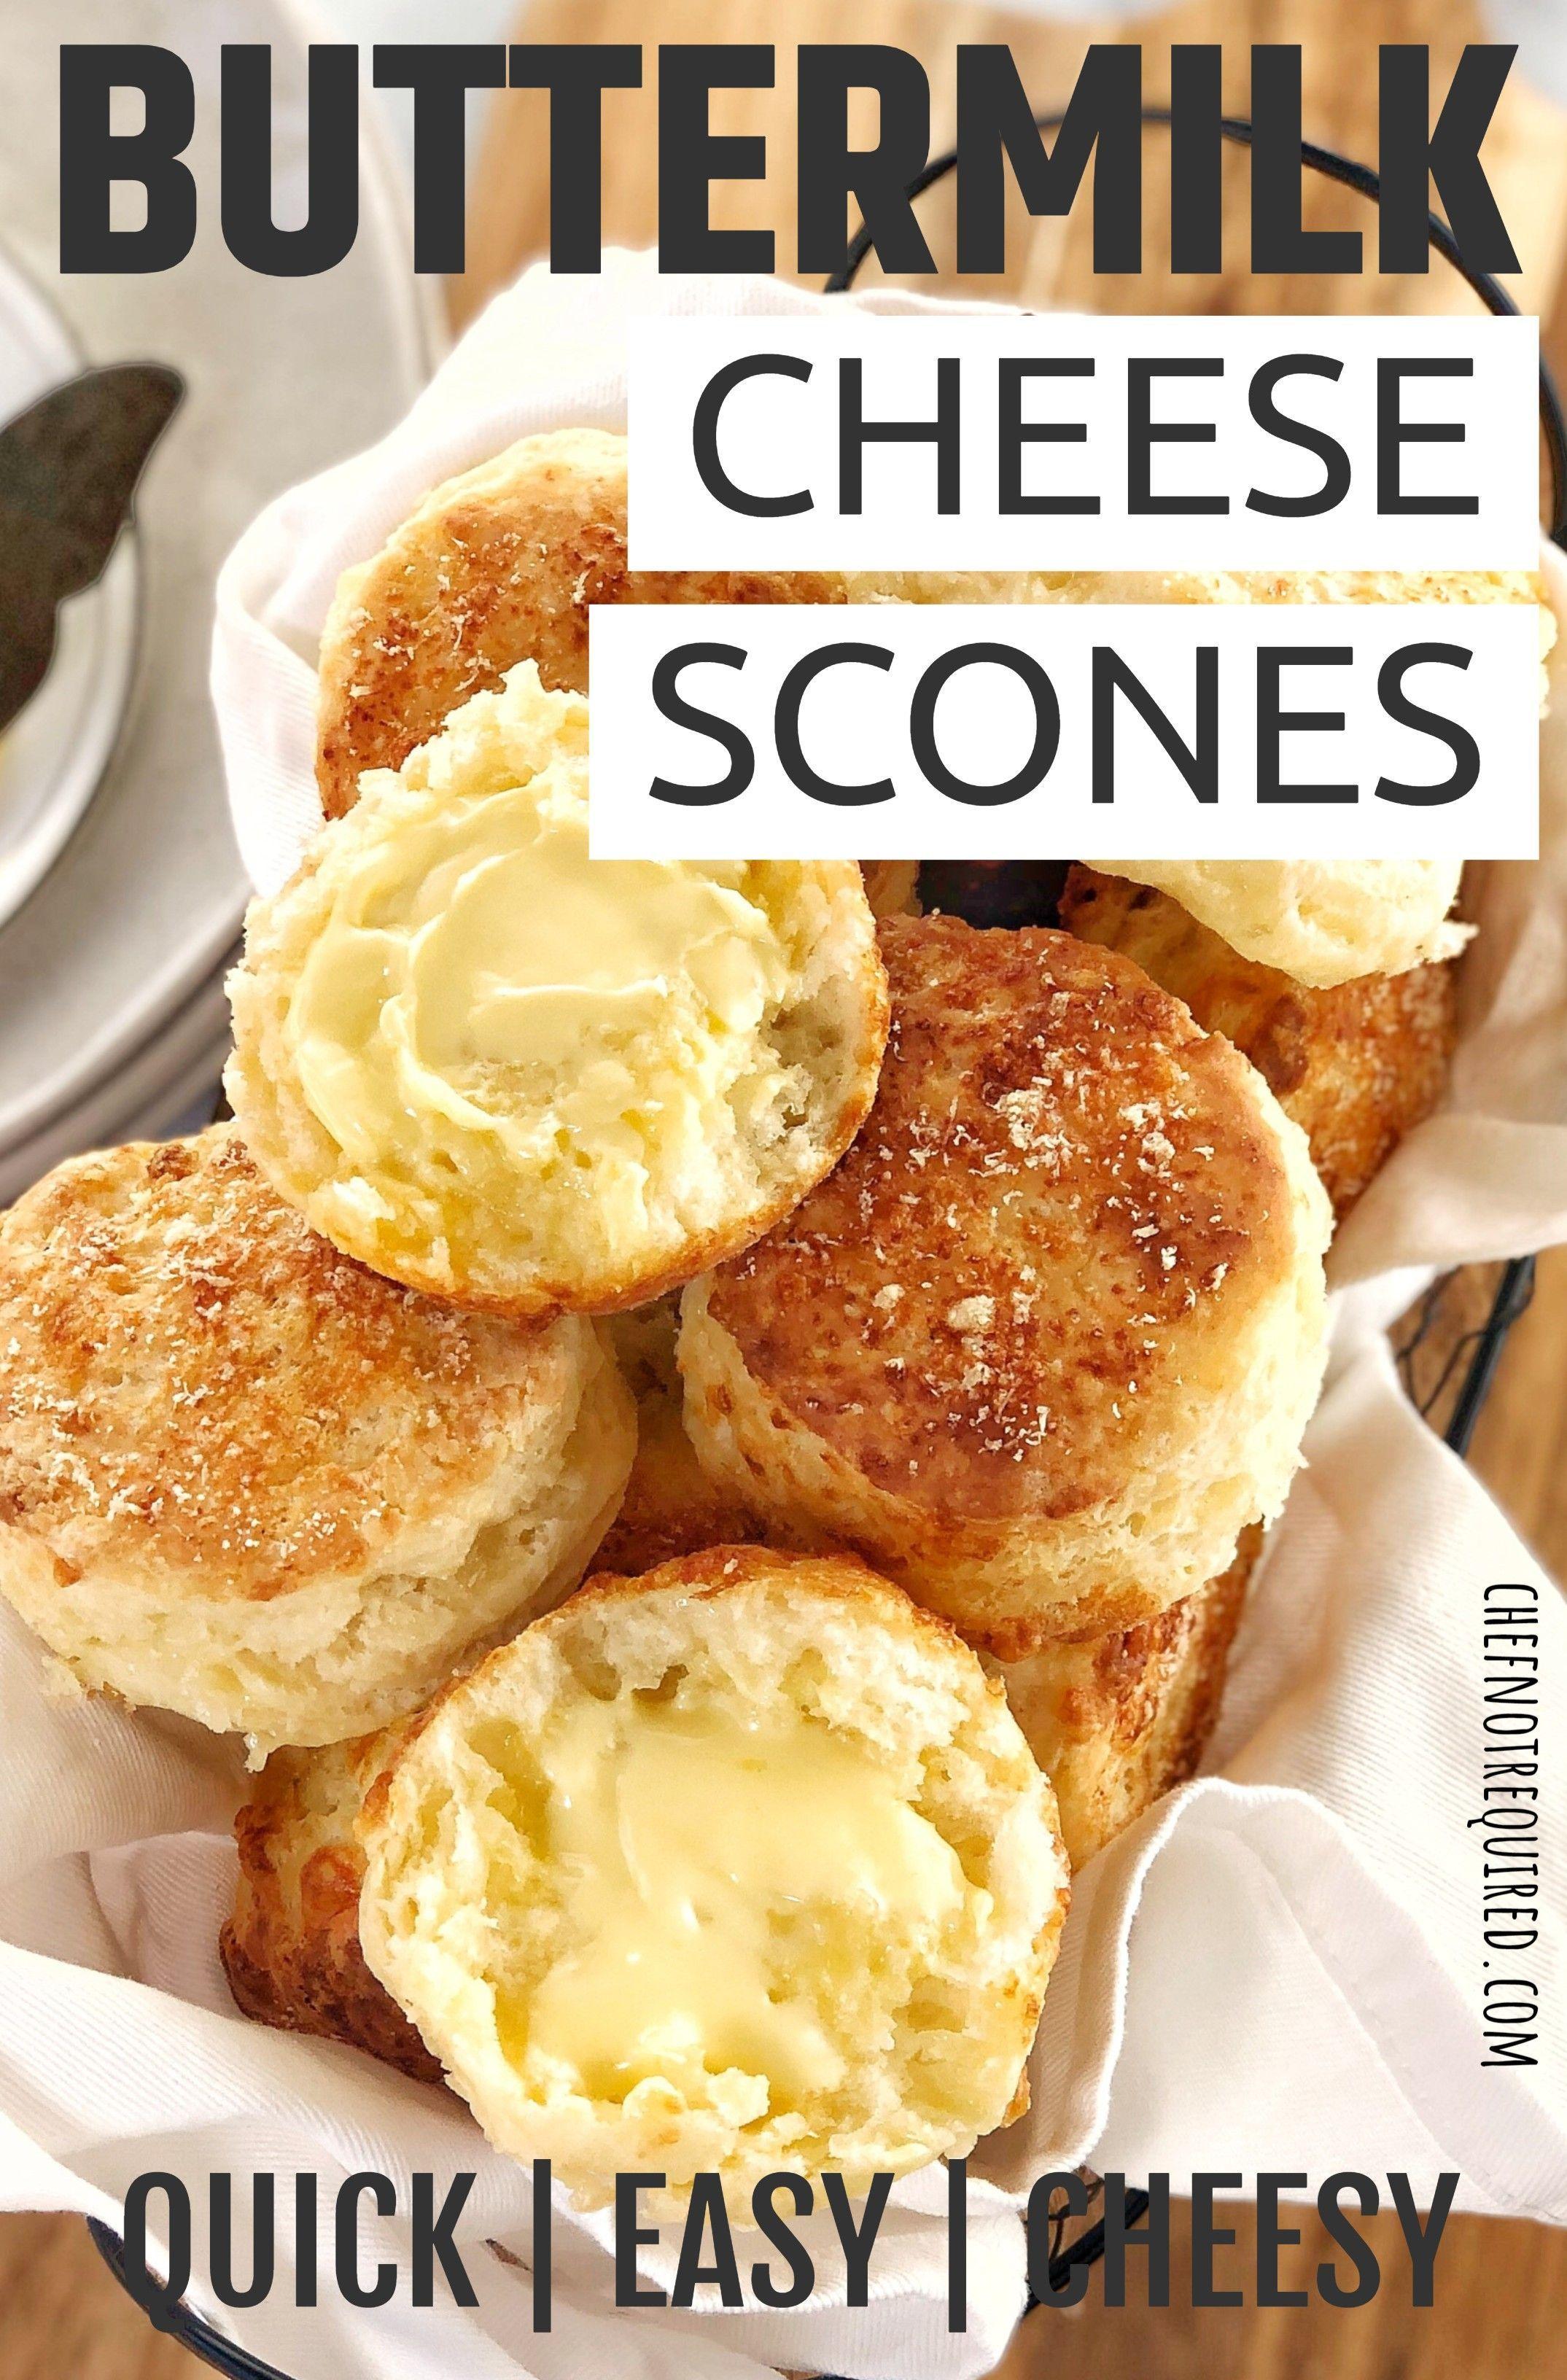 Cheese Scones In 2020 Cheese Scones Scones Super Easy Recipes